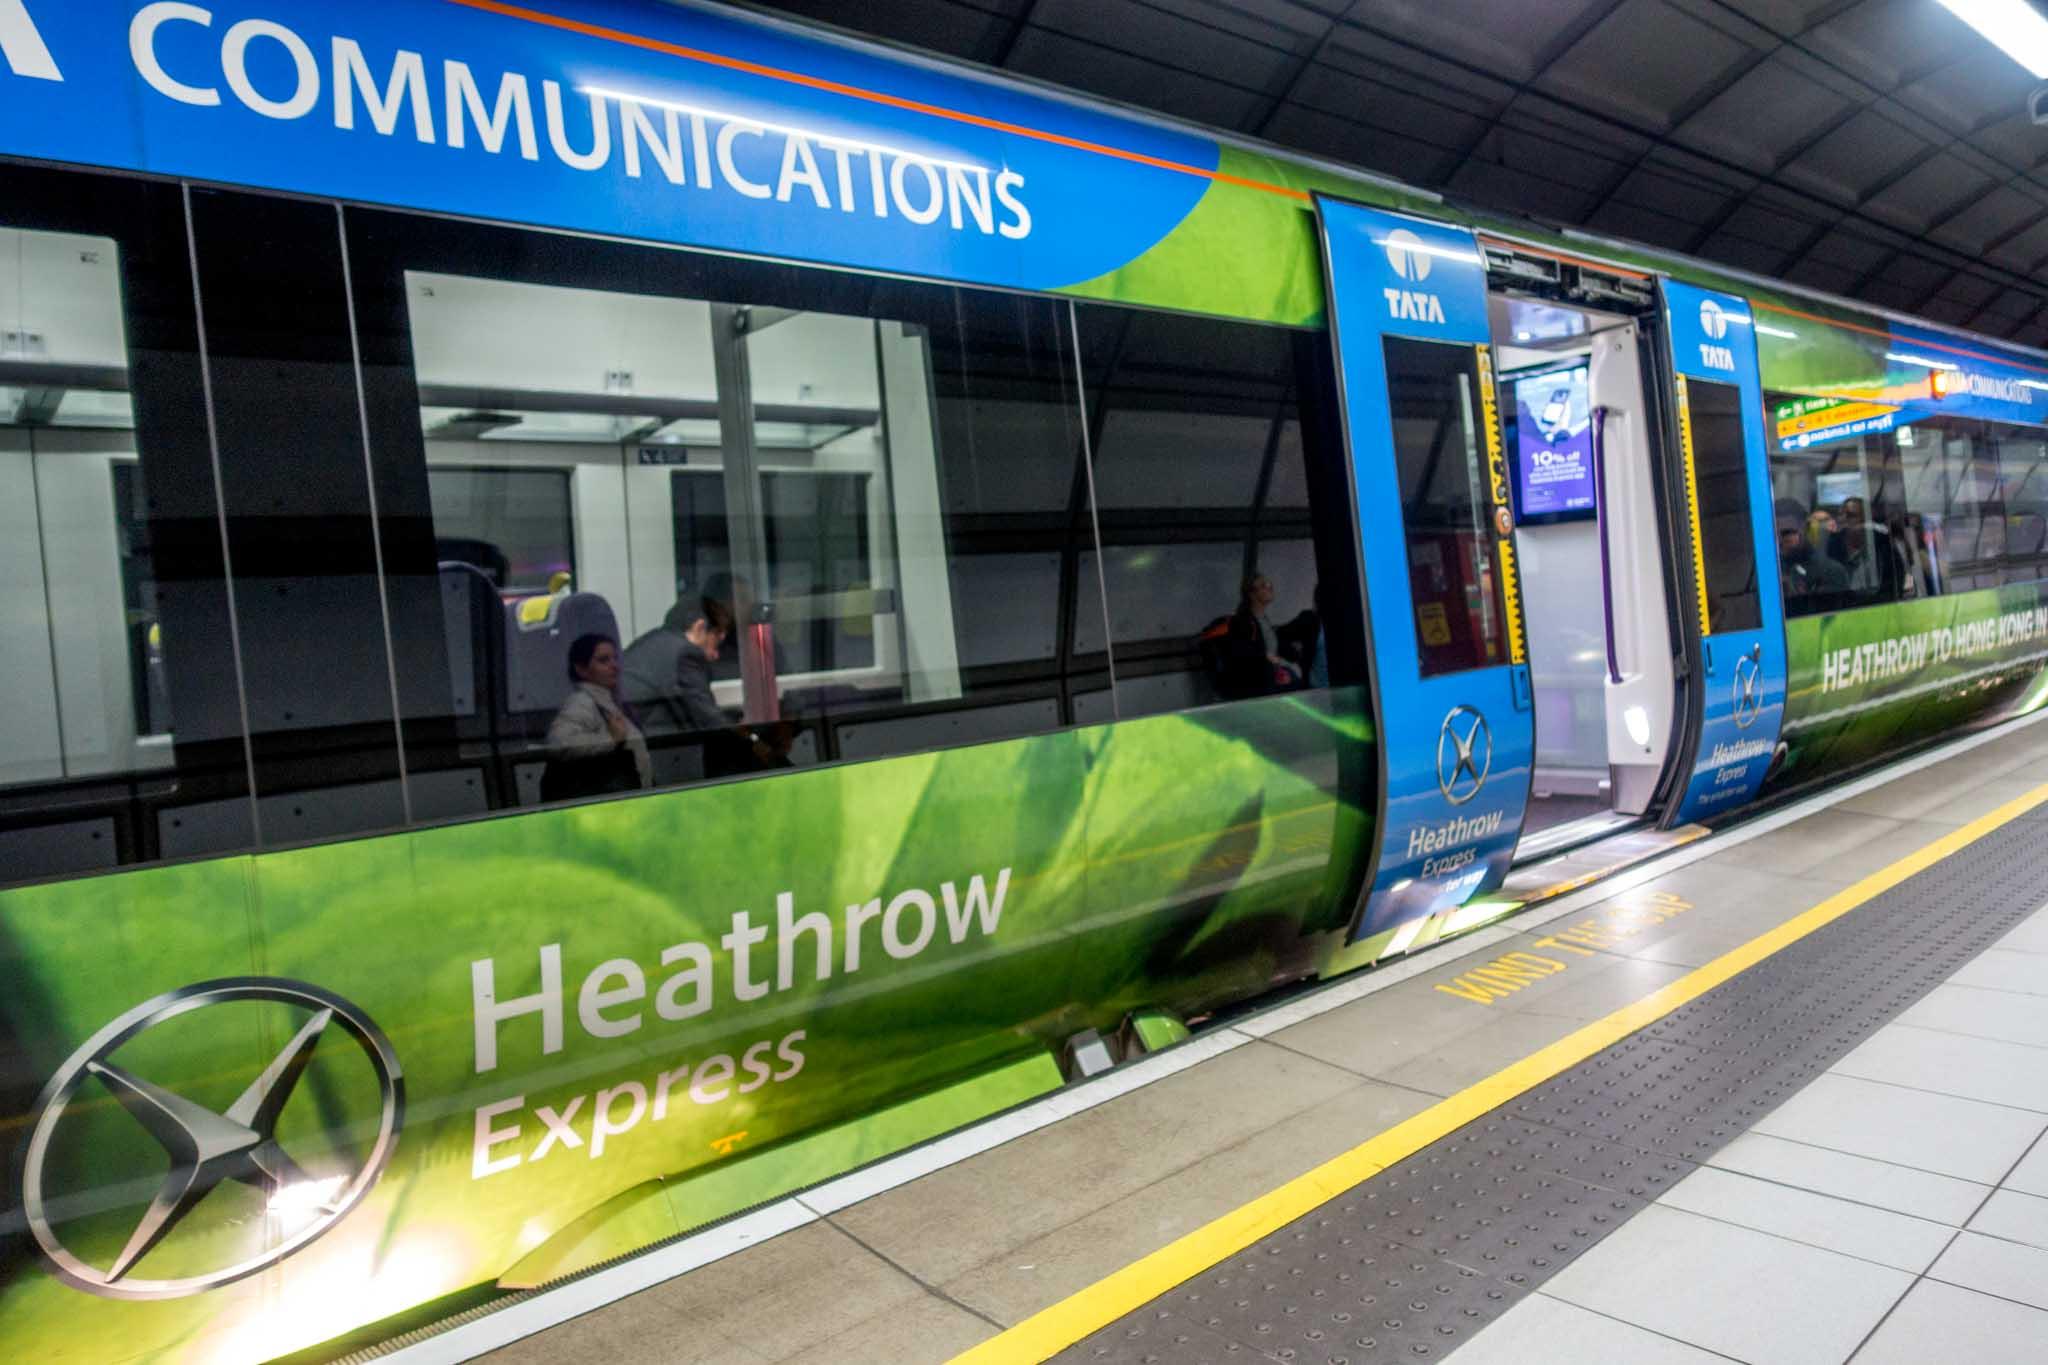 London Heathrow Express train cars